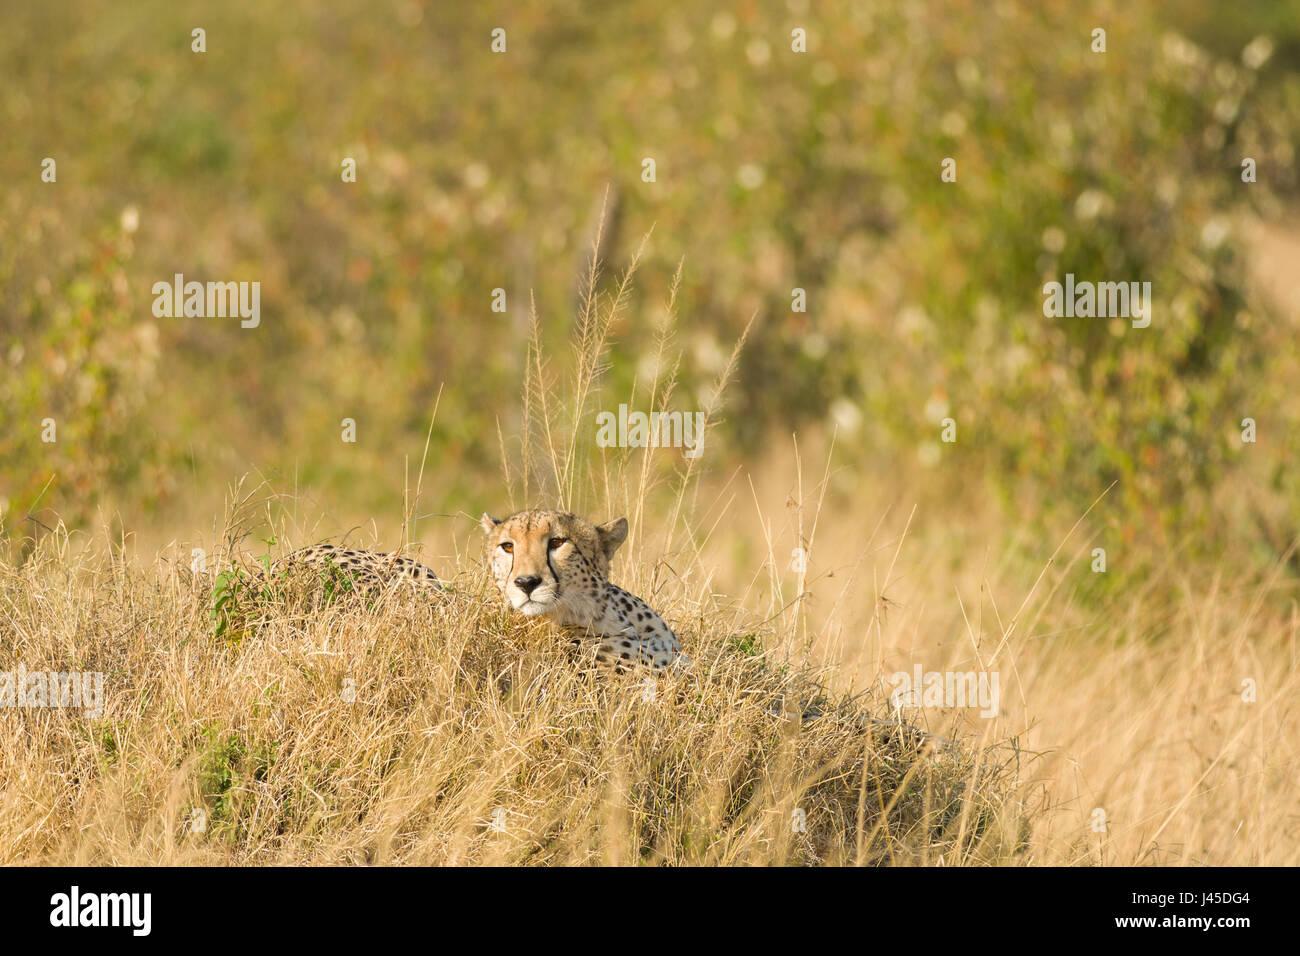 Cheetah (Acinonyx jubatus) Resting on Mound, Maasai Mara, Kenya Stock Photo